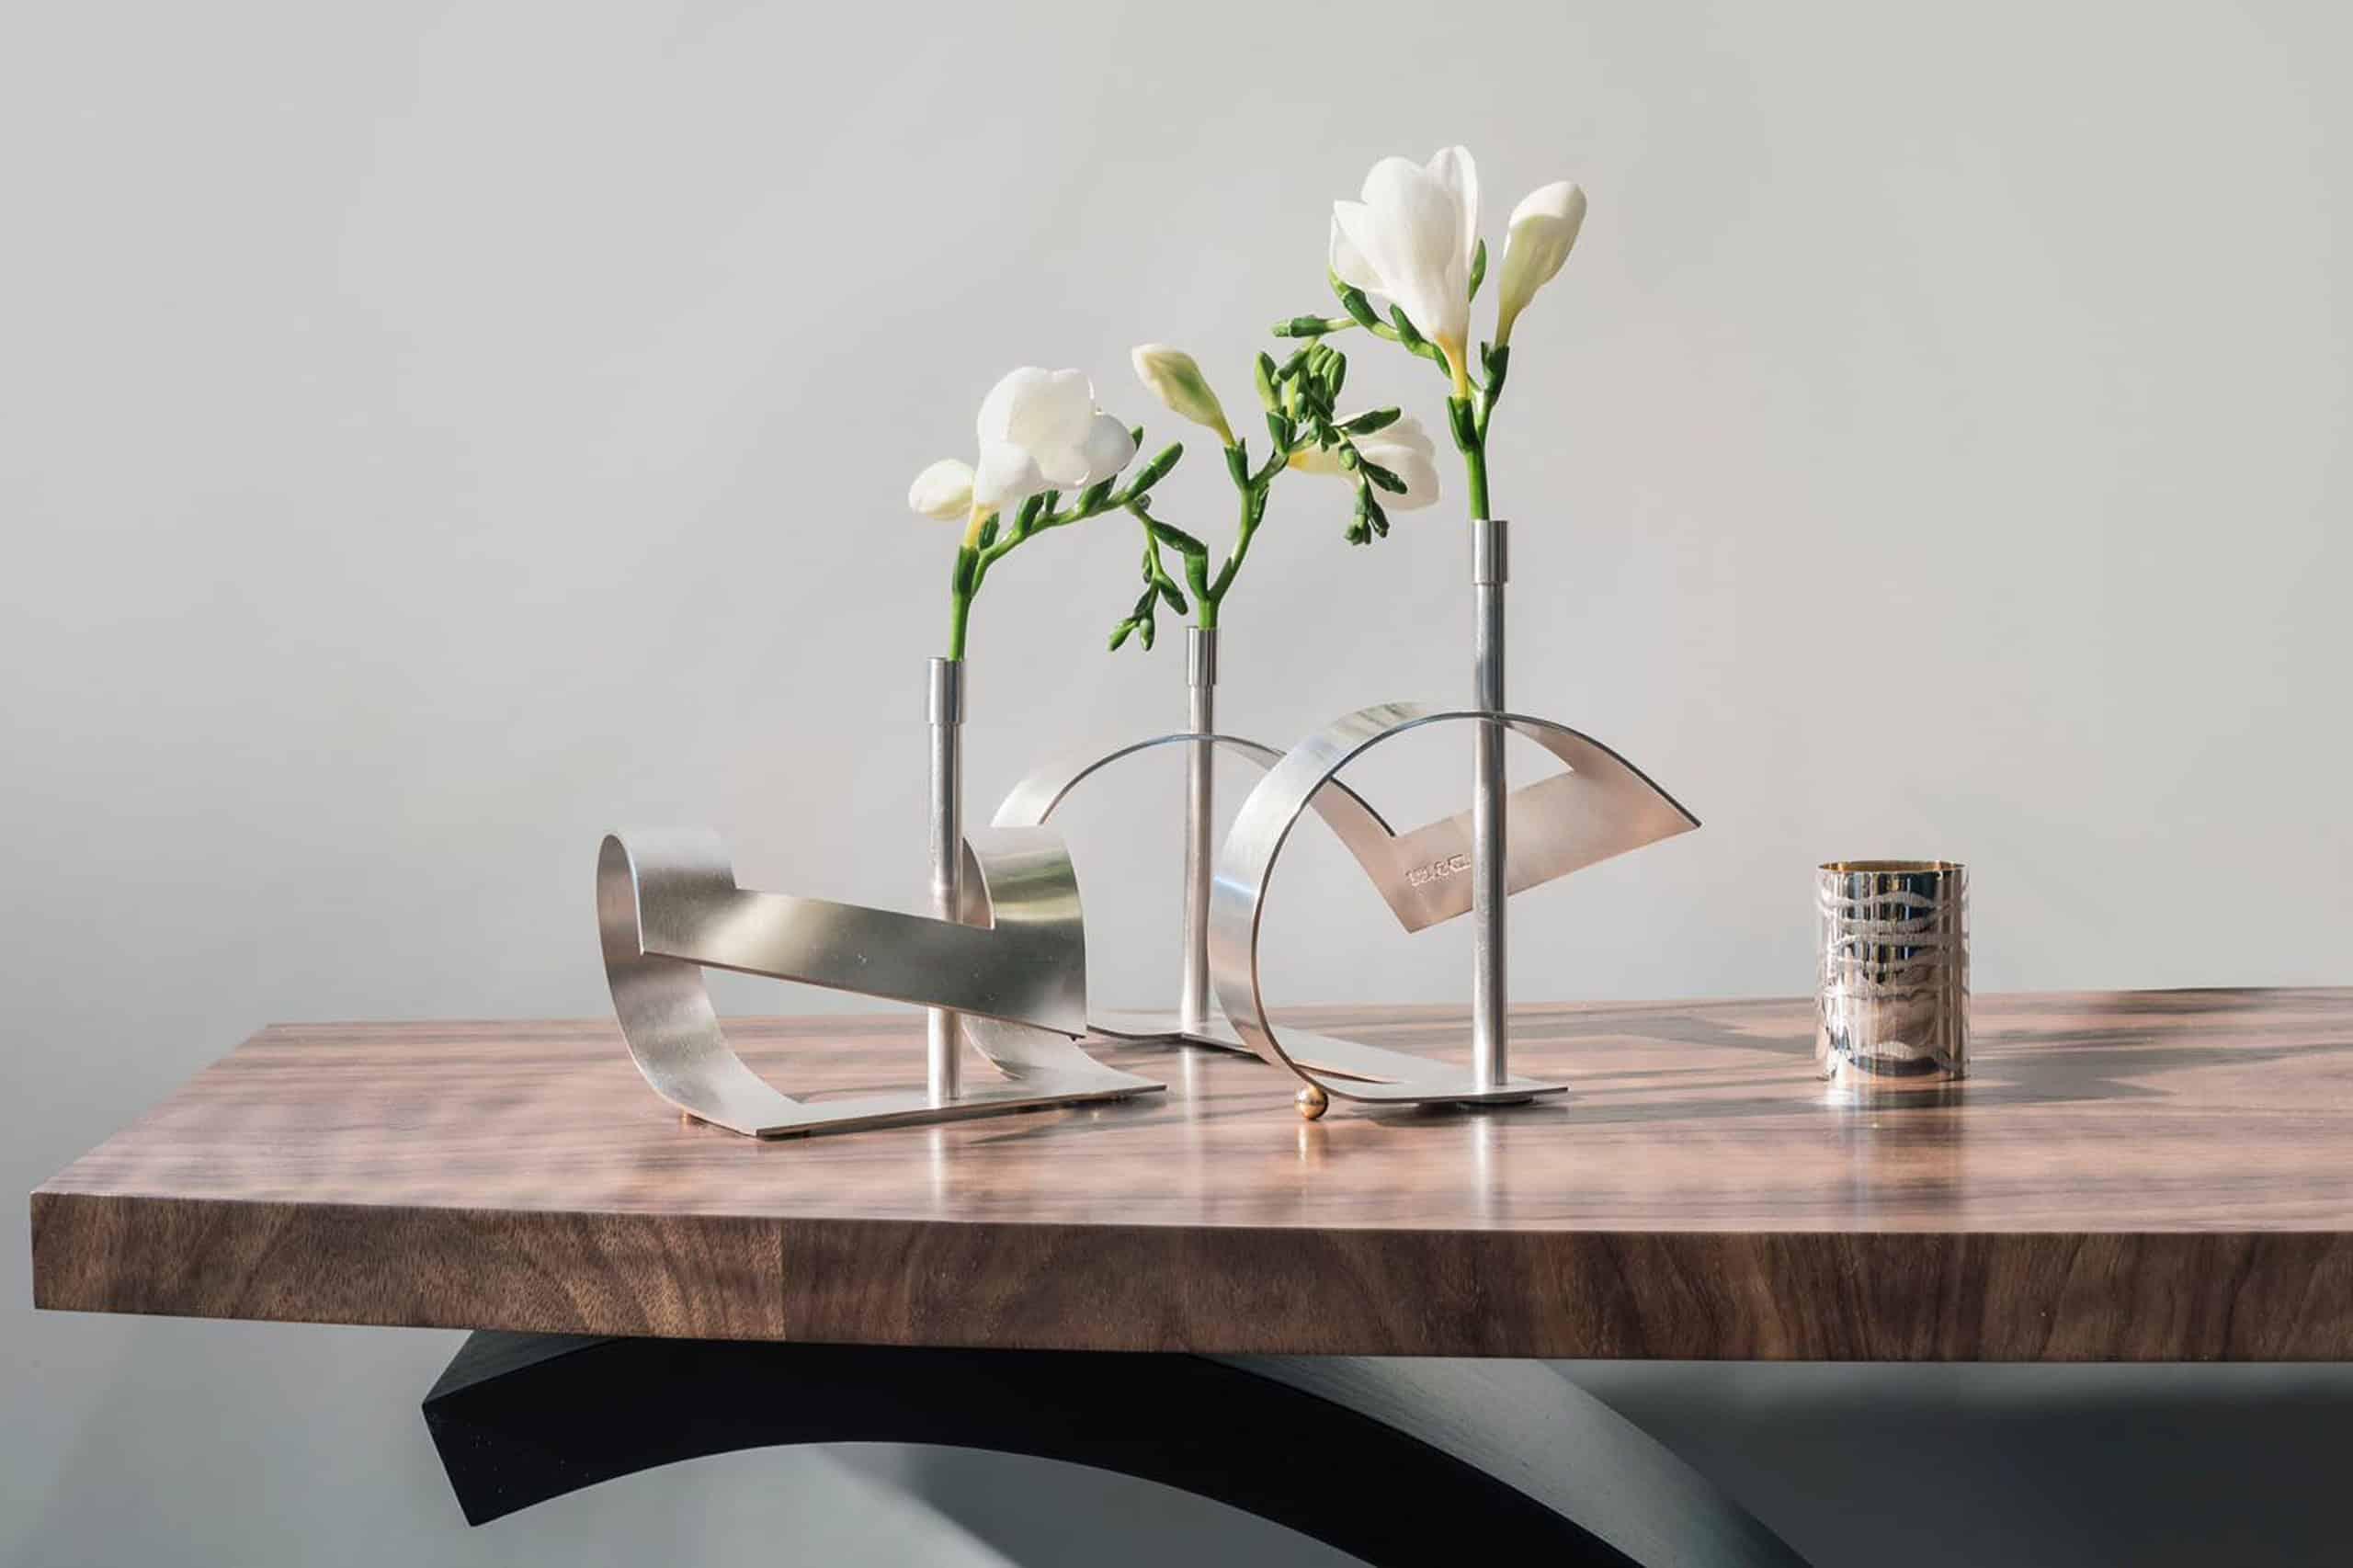 Fenella Watson designs